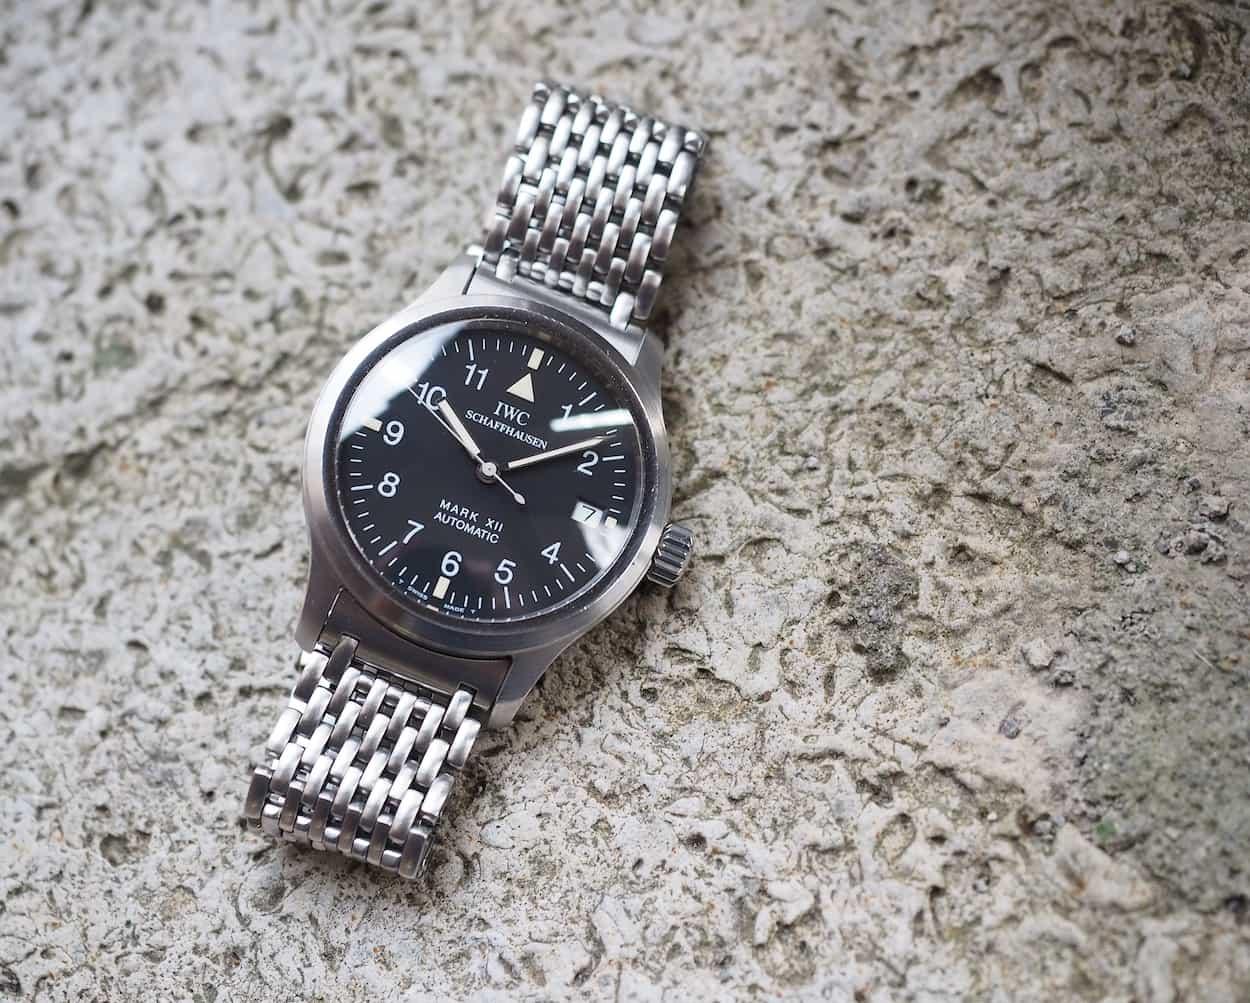 Watch marks on wrist - Iwc Mark Xii Simple Design